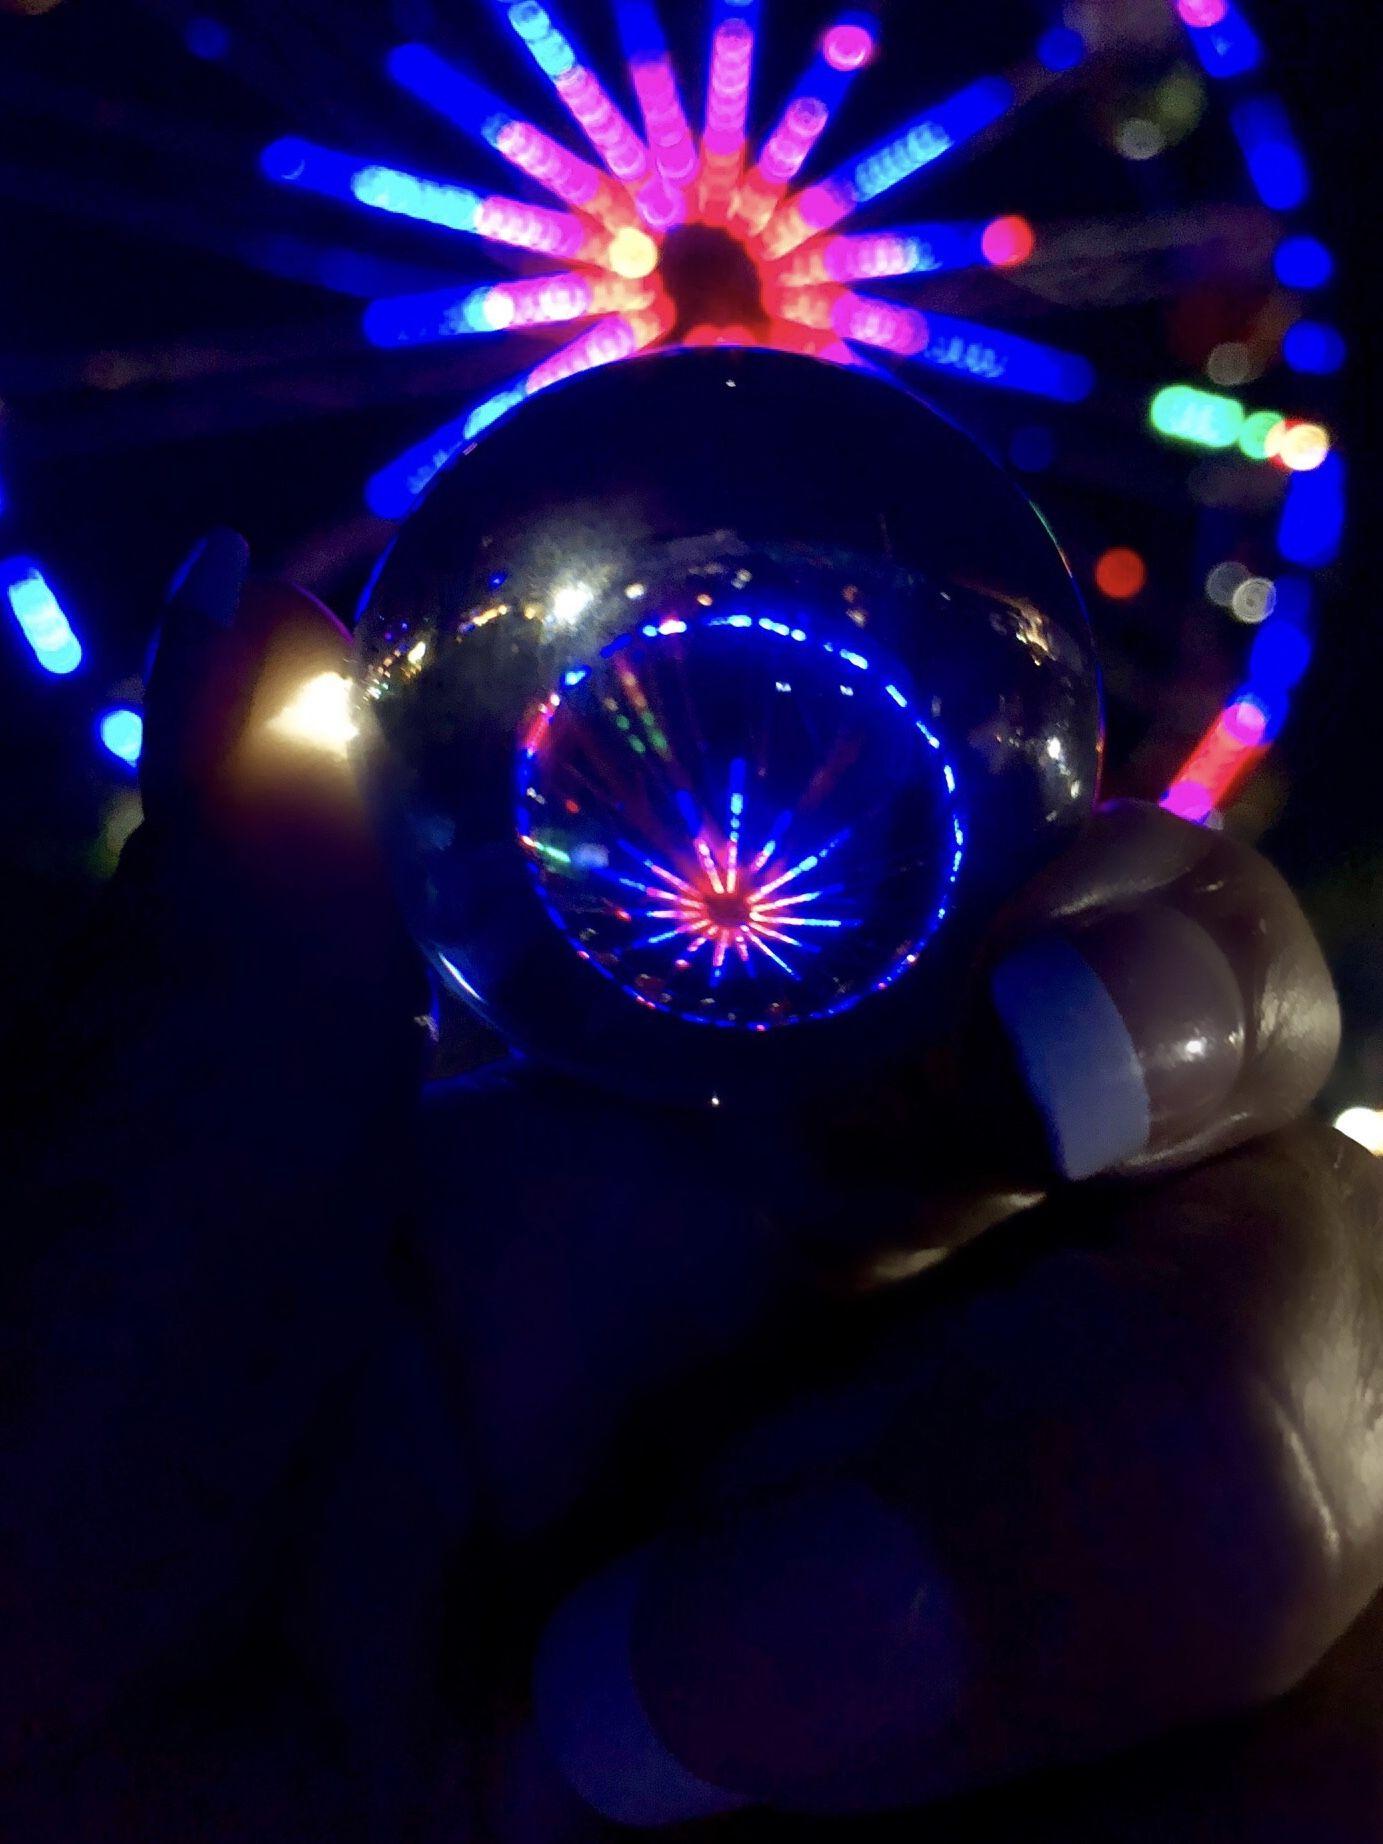 Ferris wheel in crystal ball crystals christmas bulbs